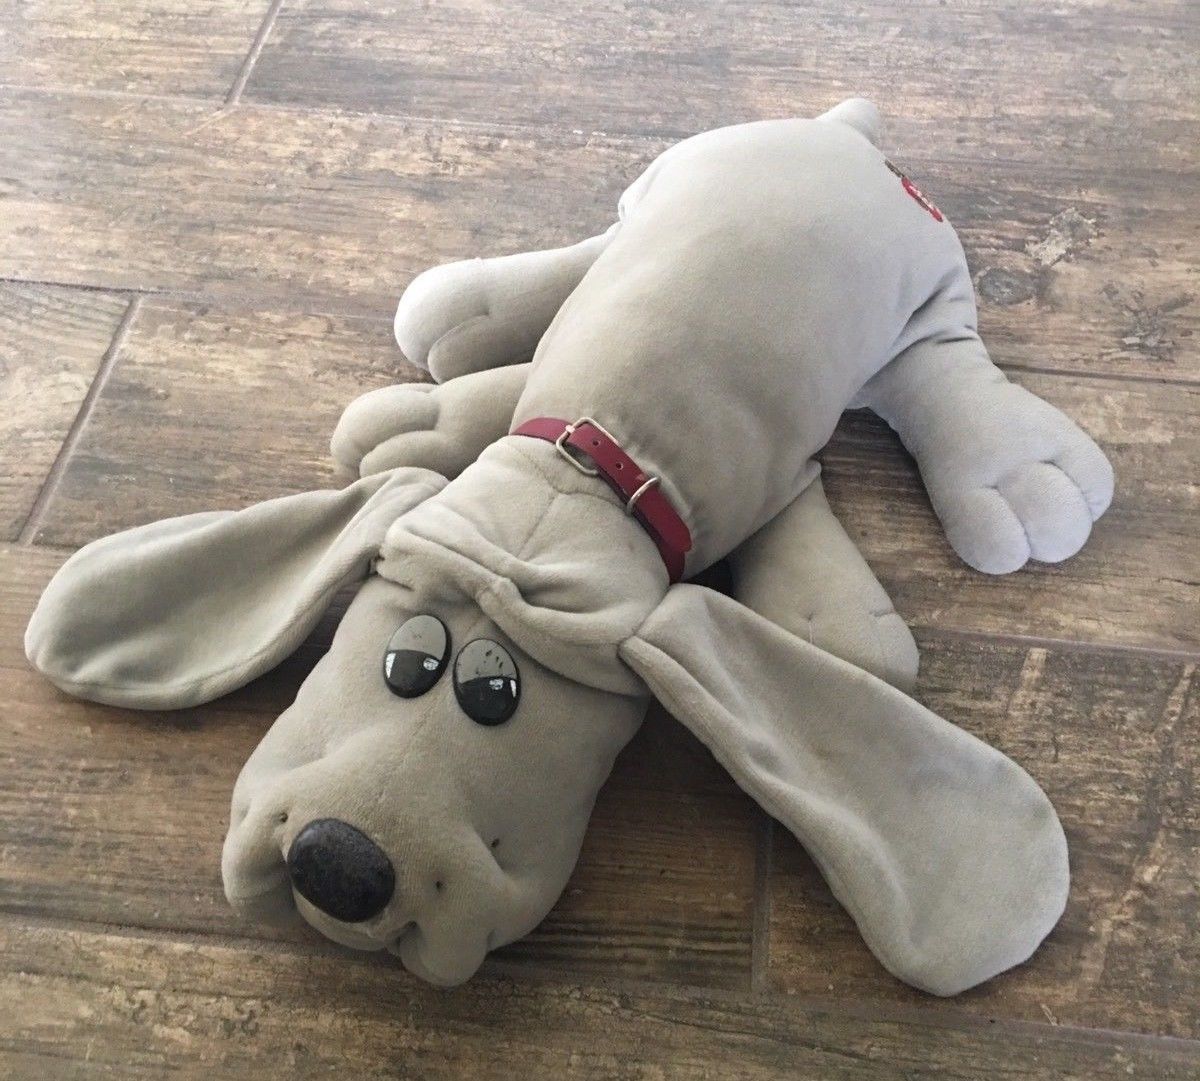 Tonka Pound Puppies Plush Doll 1990s 1 listing